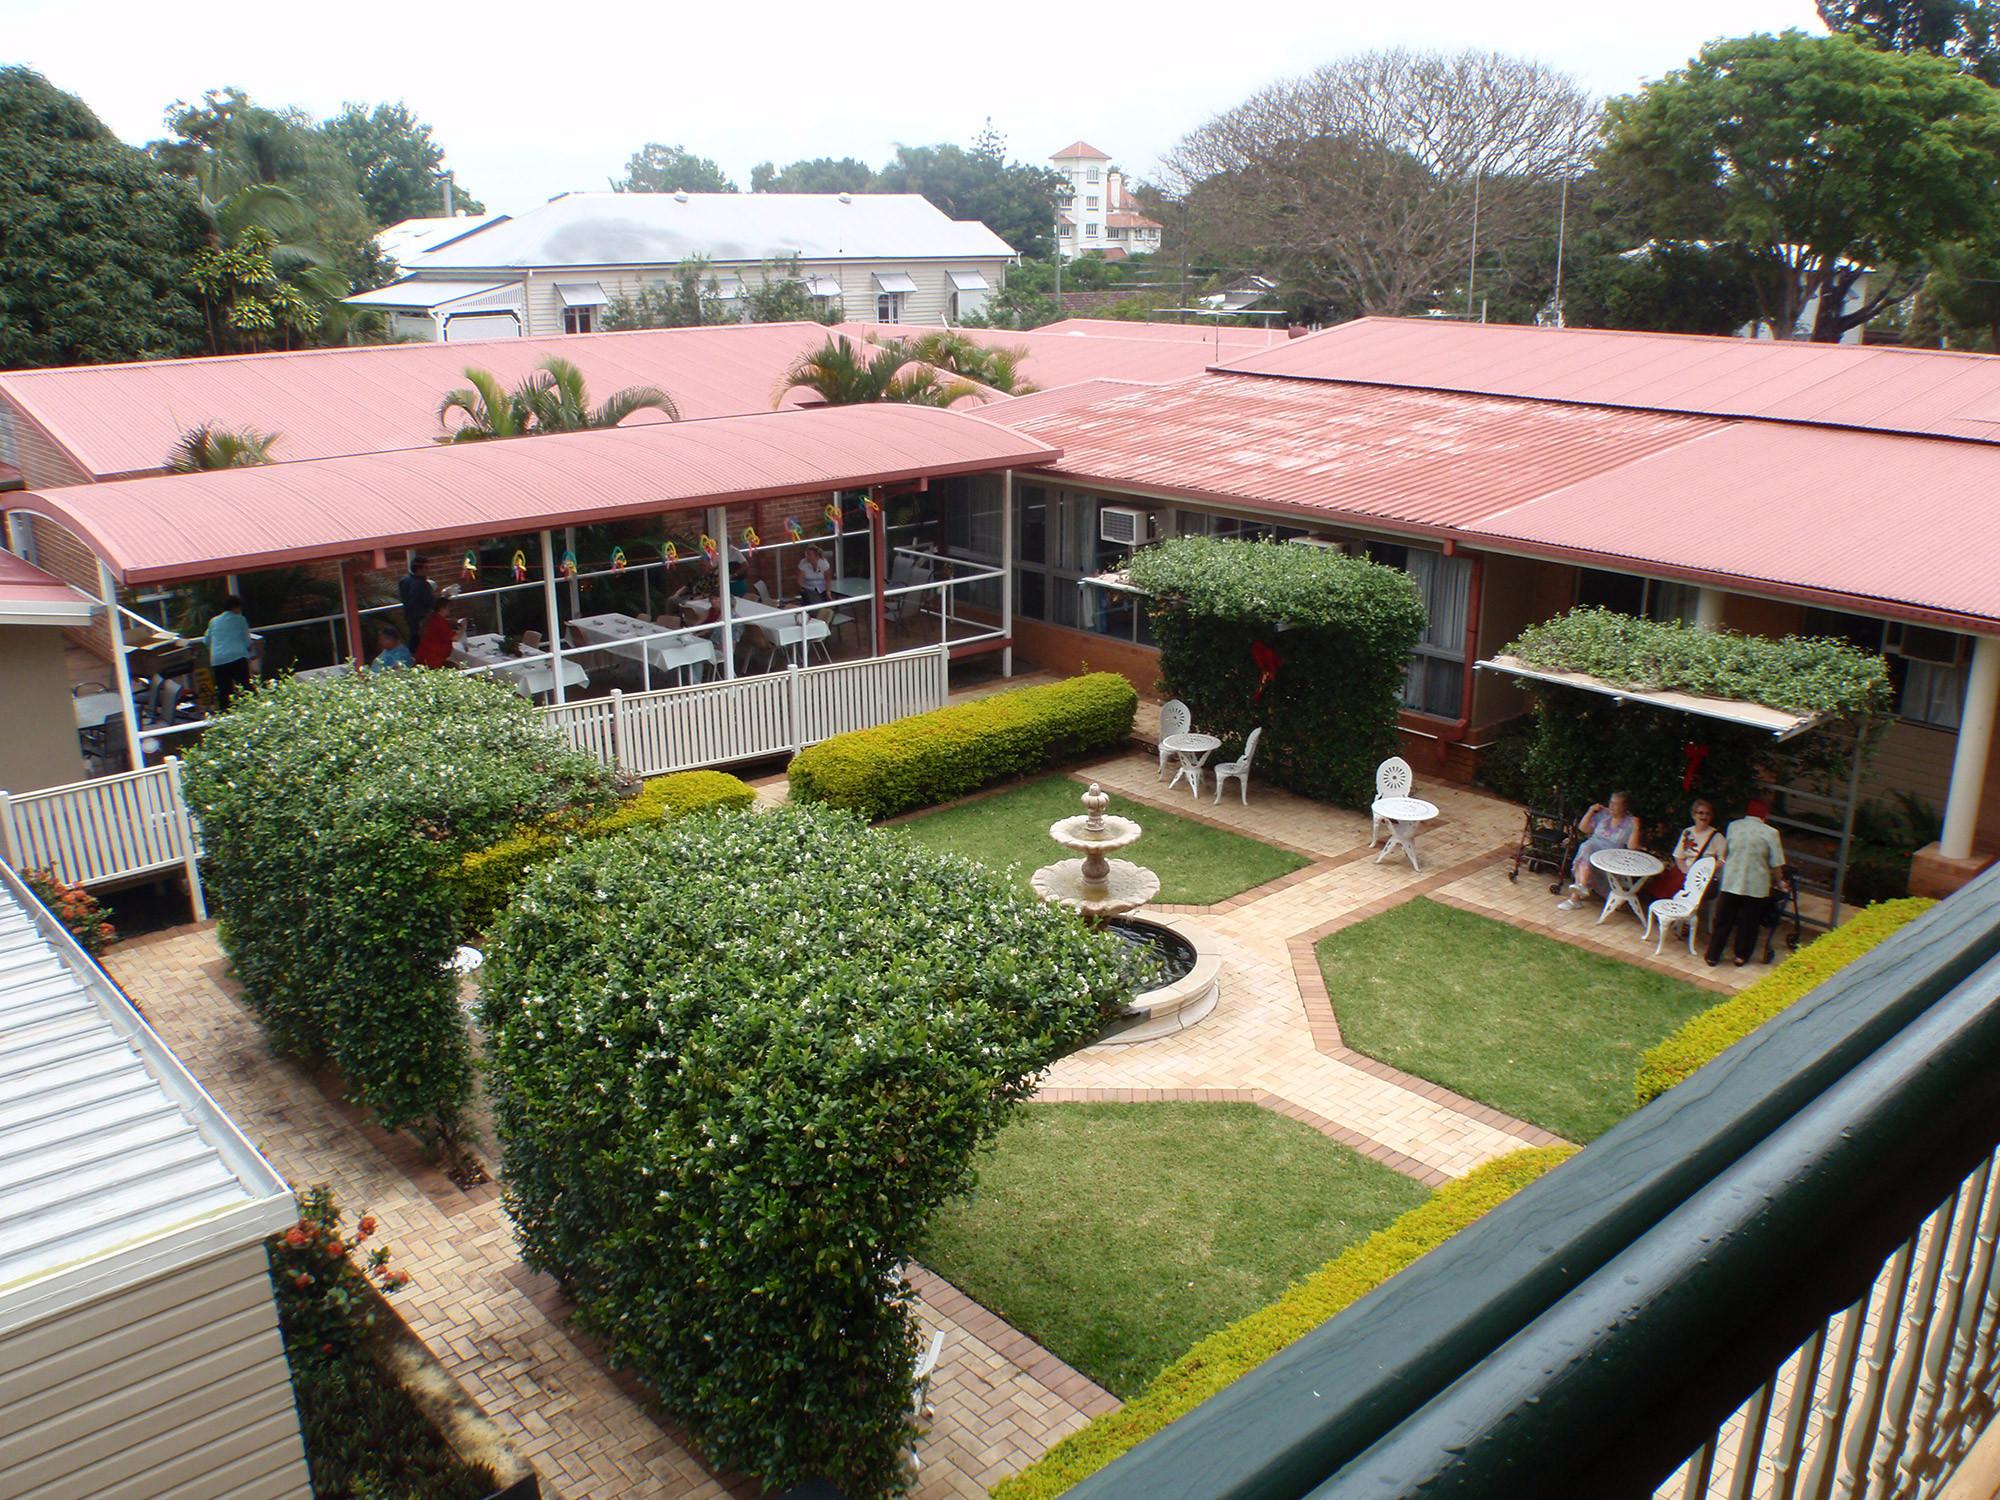 Courtyard birds-eye view